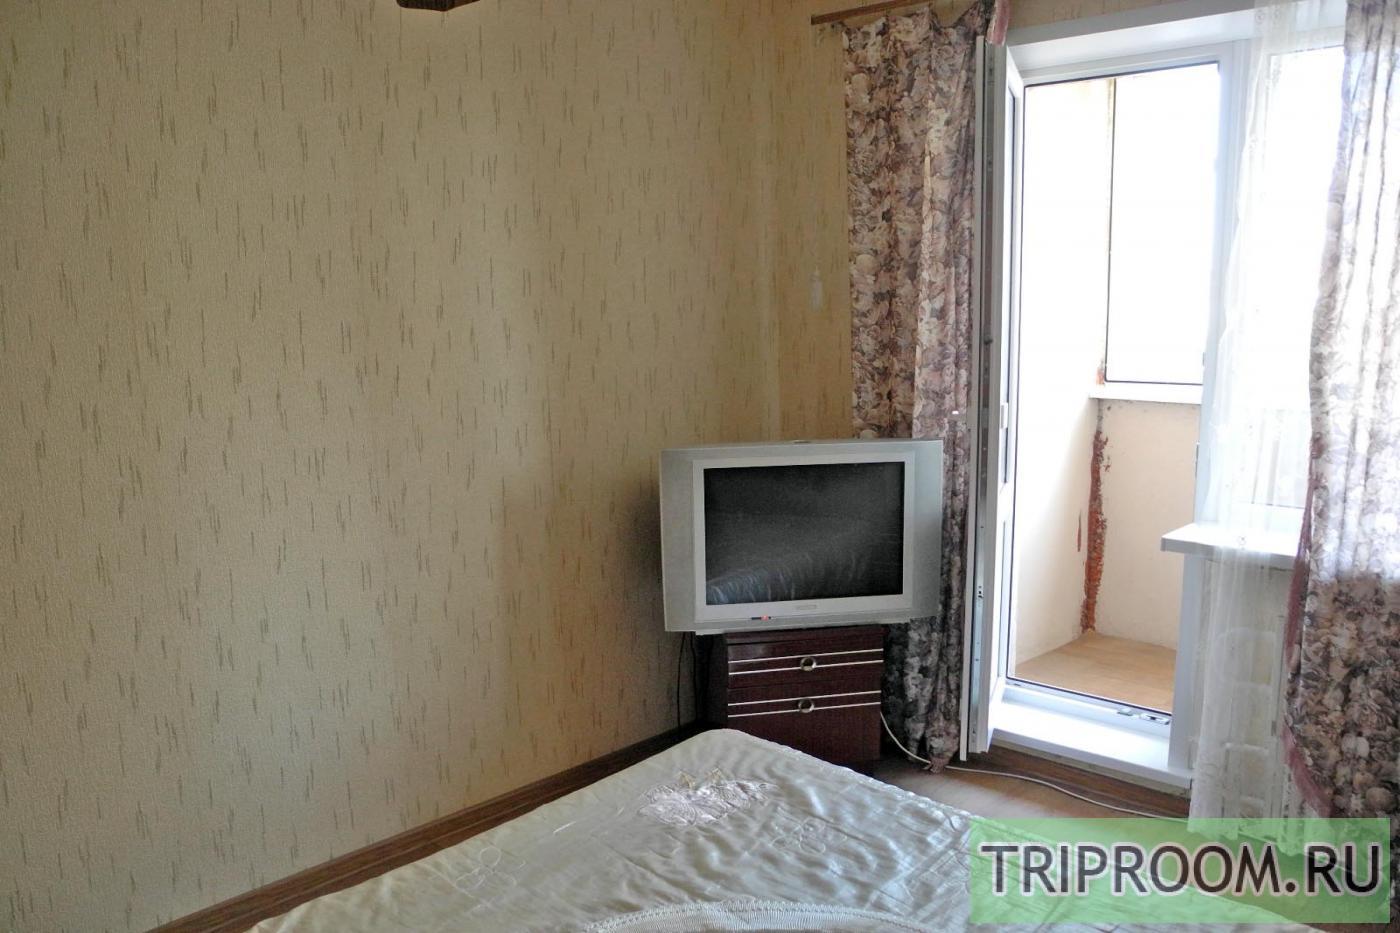 2-комнатная квартира посуточно (вариант № 3868), ул. Кропоткина улица, фото № 6